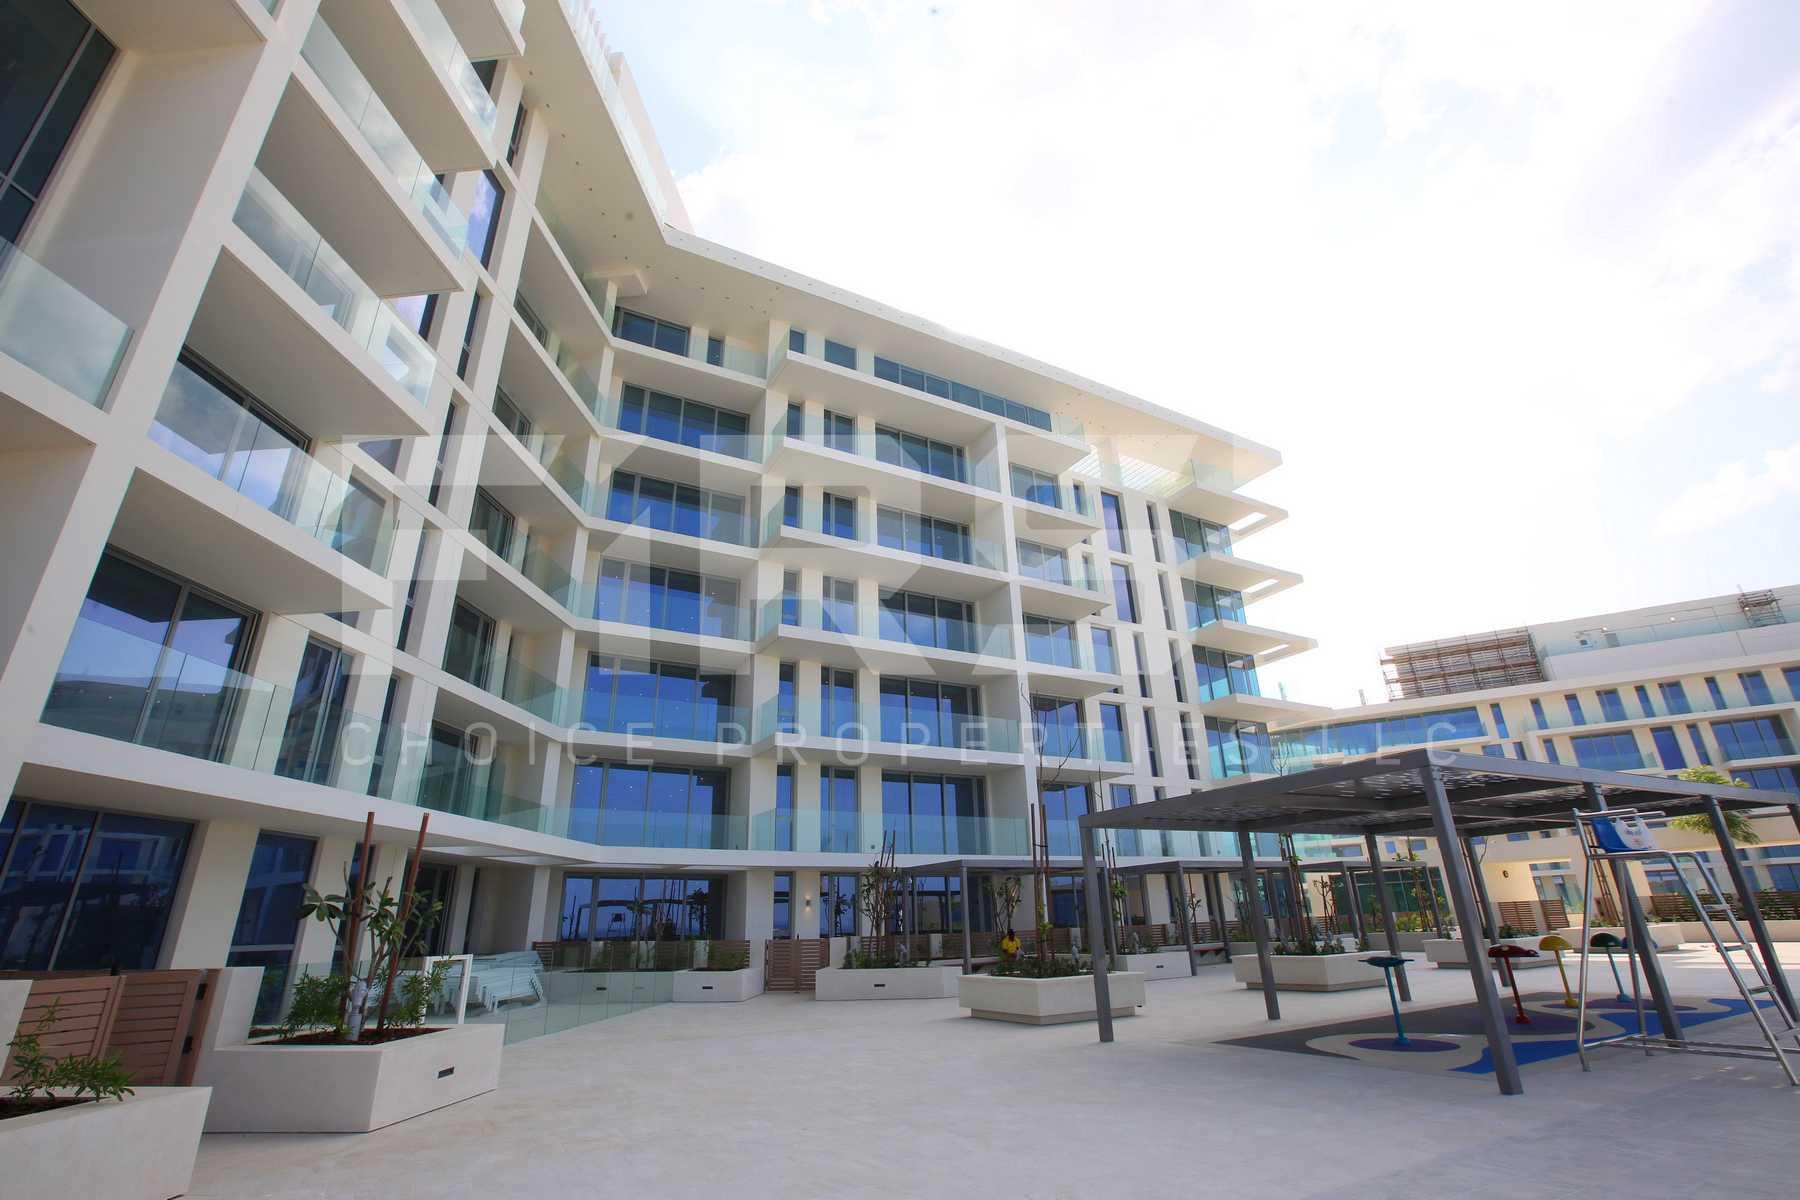 External Photo of Mamsha Al Saadiyat Island UAE (2).jpg